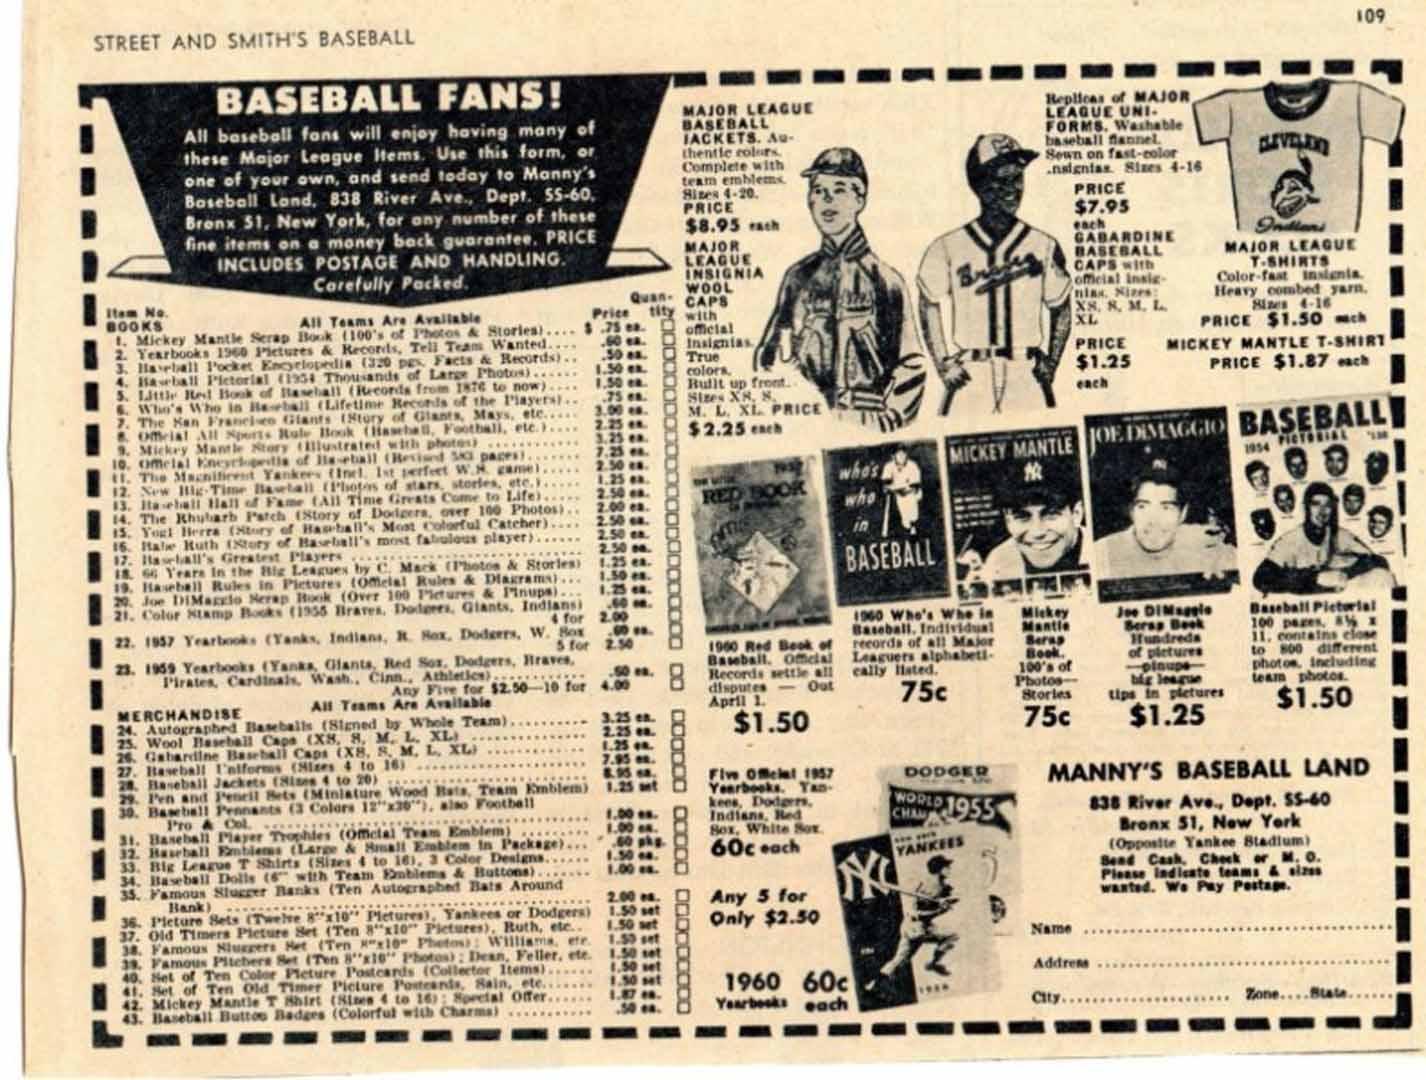 1960 era street smiths baseball